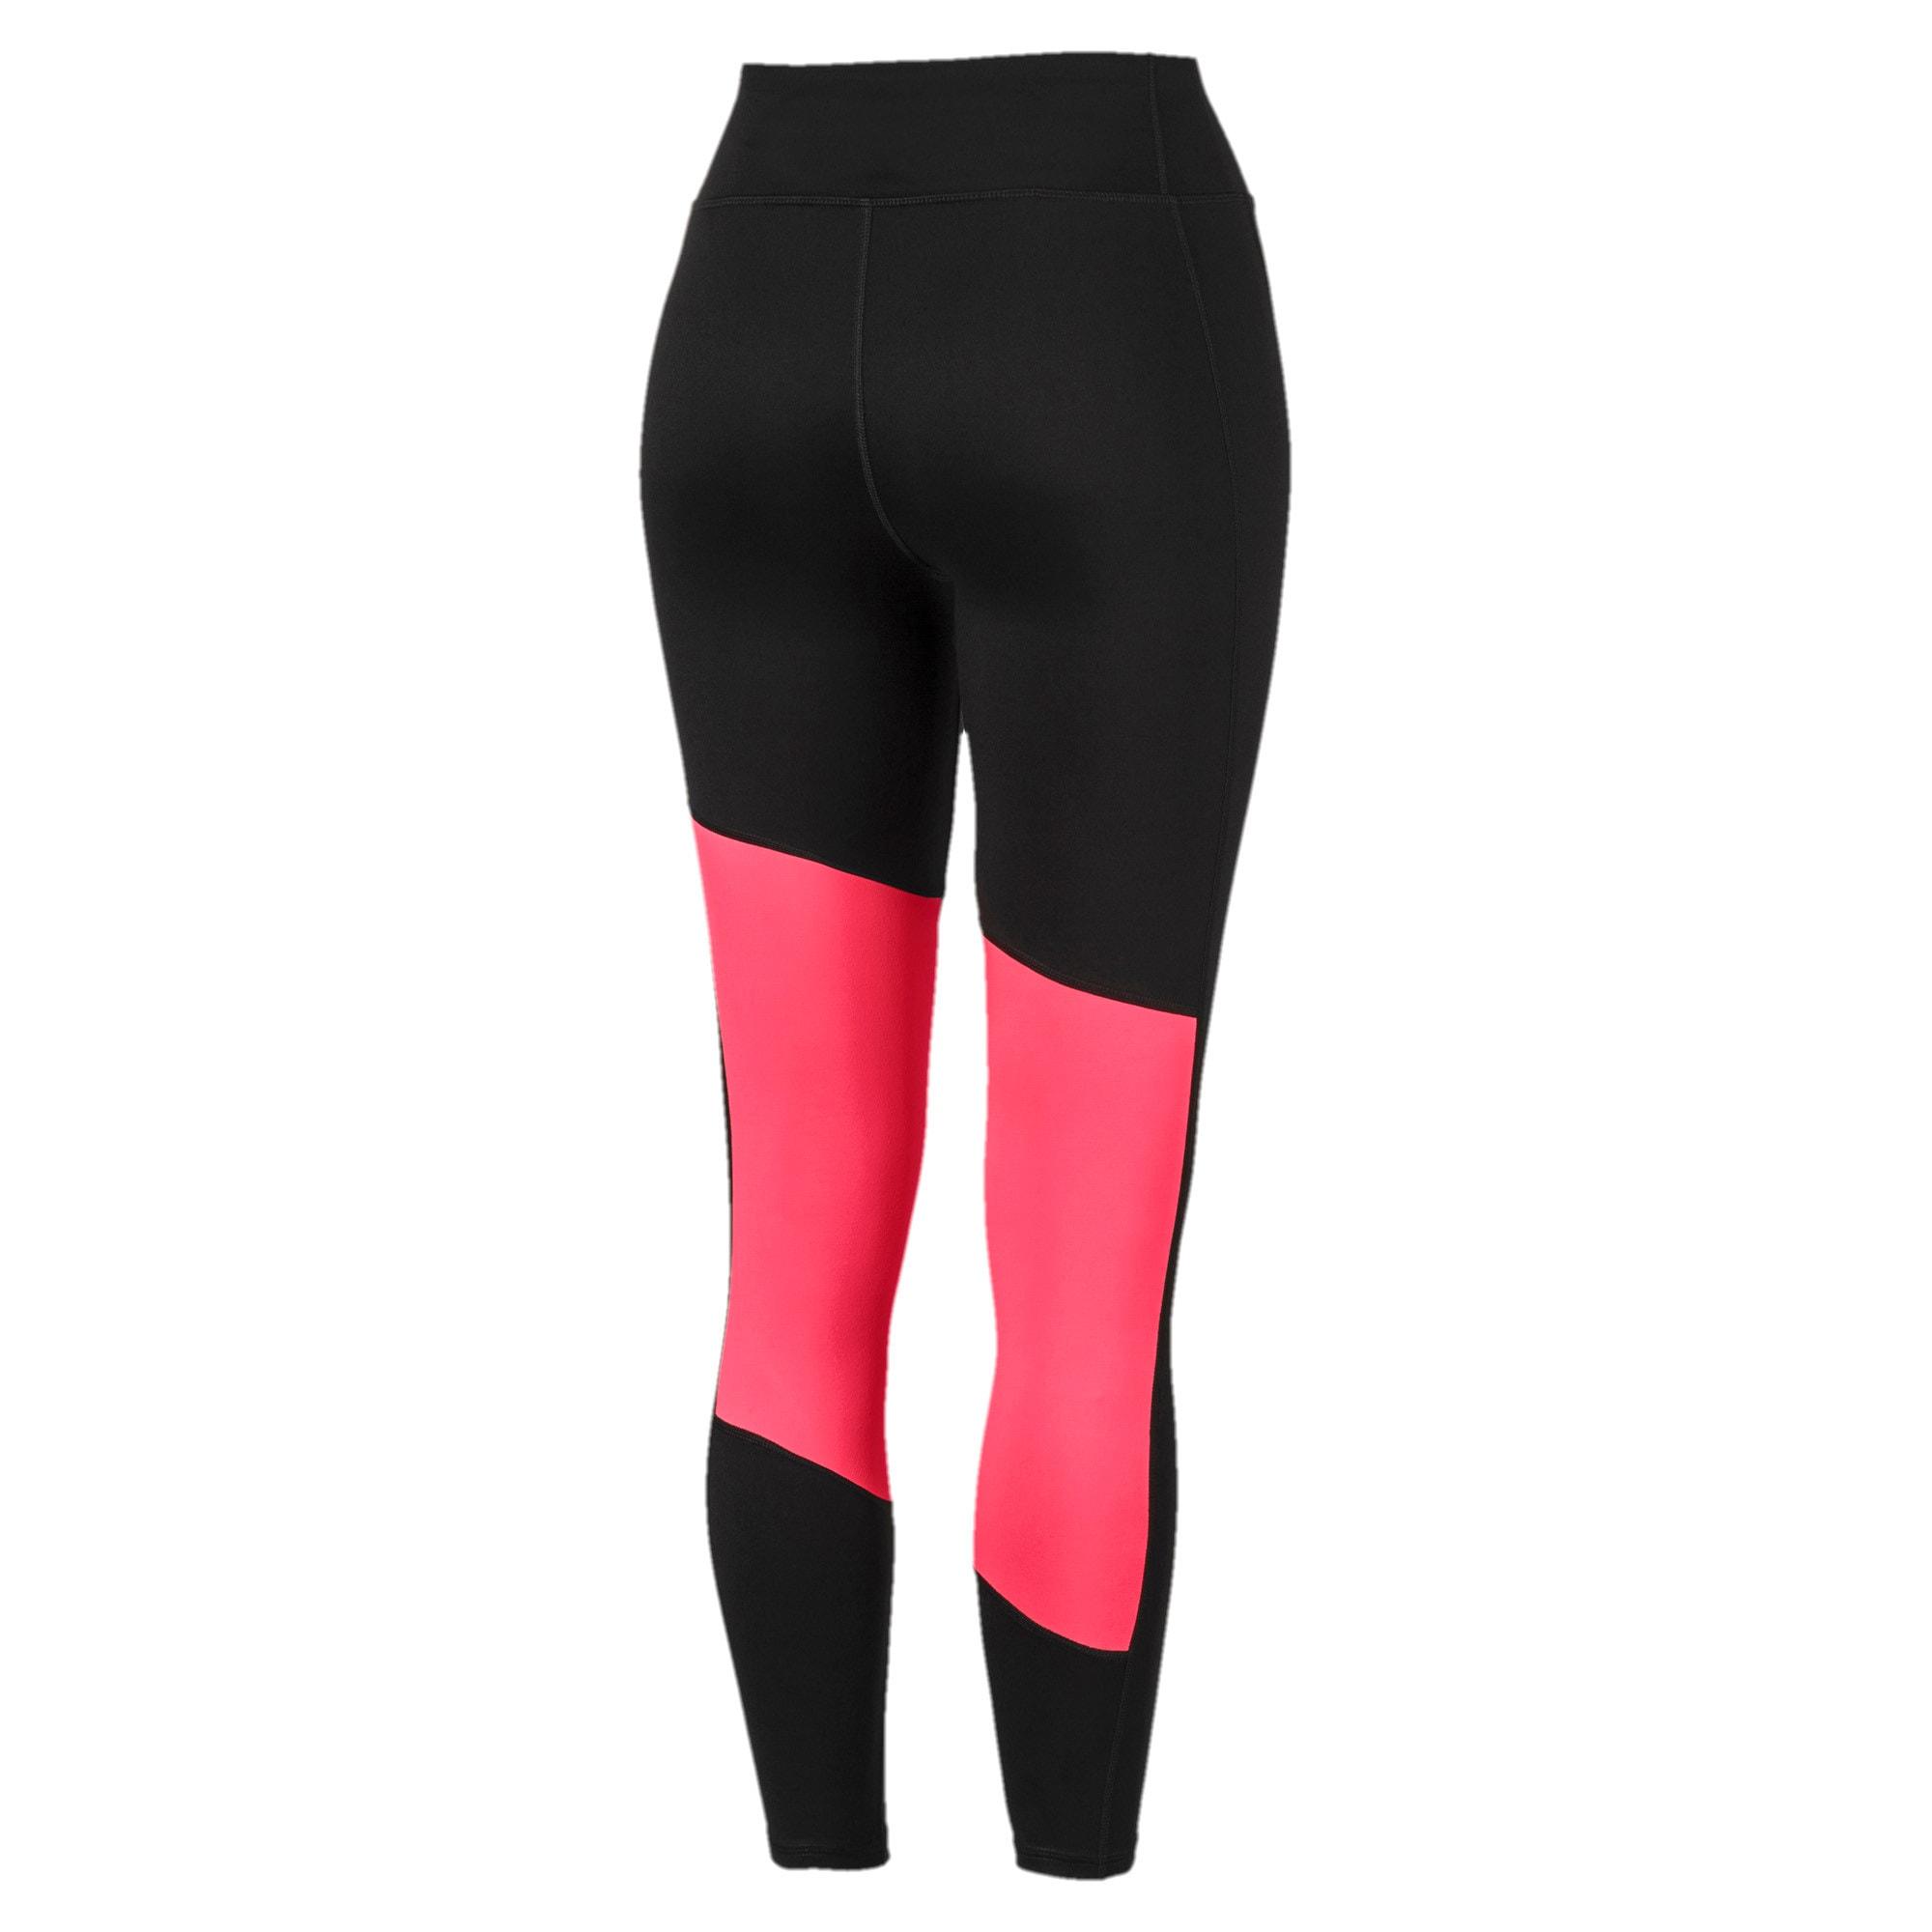 Thumbnail 5 of Logo 7/8 Graphic Women's Training Leggings, Puma Black-Pink Alert, medium